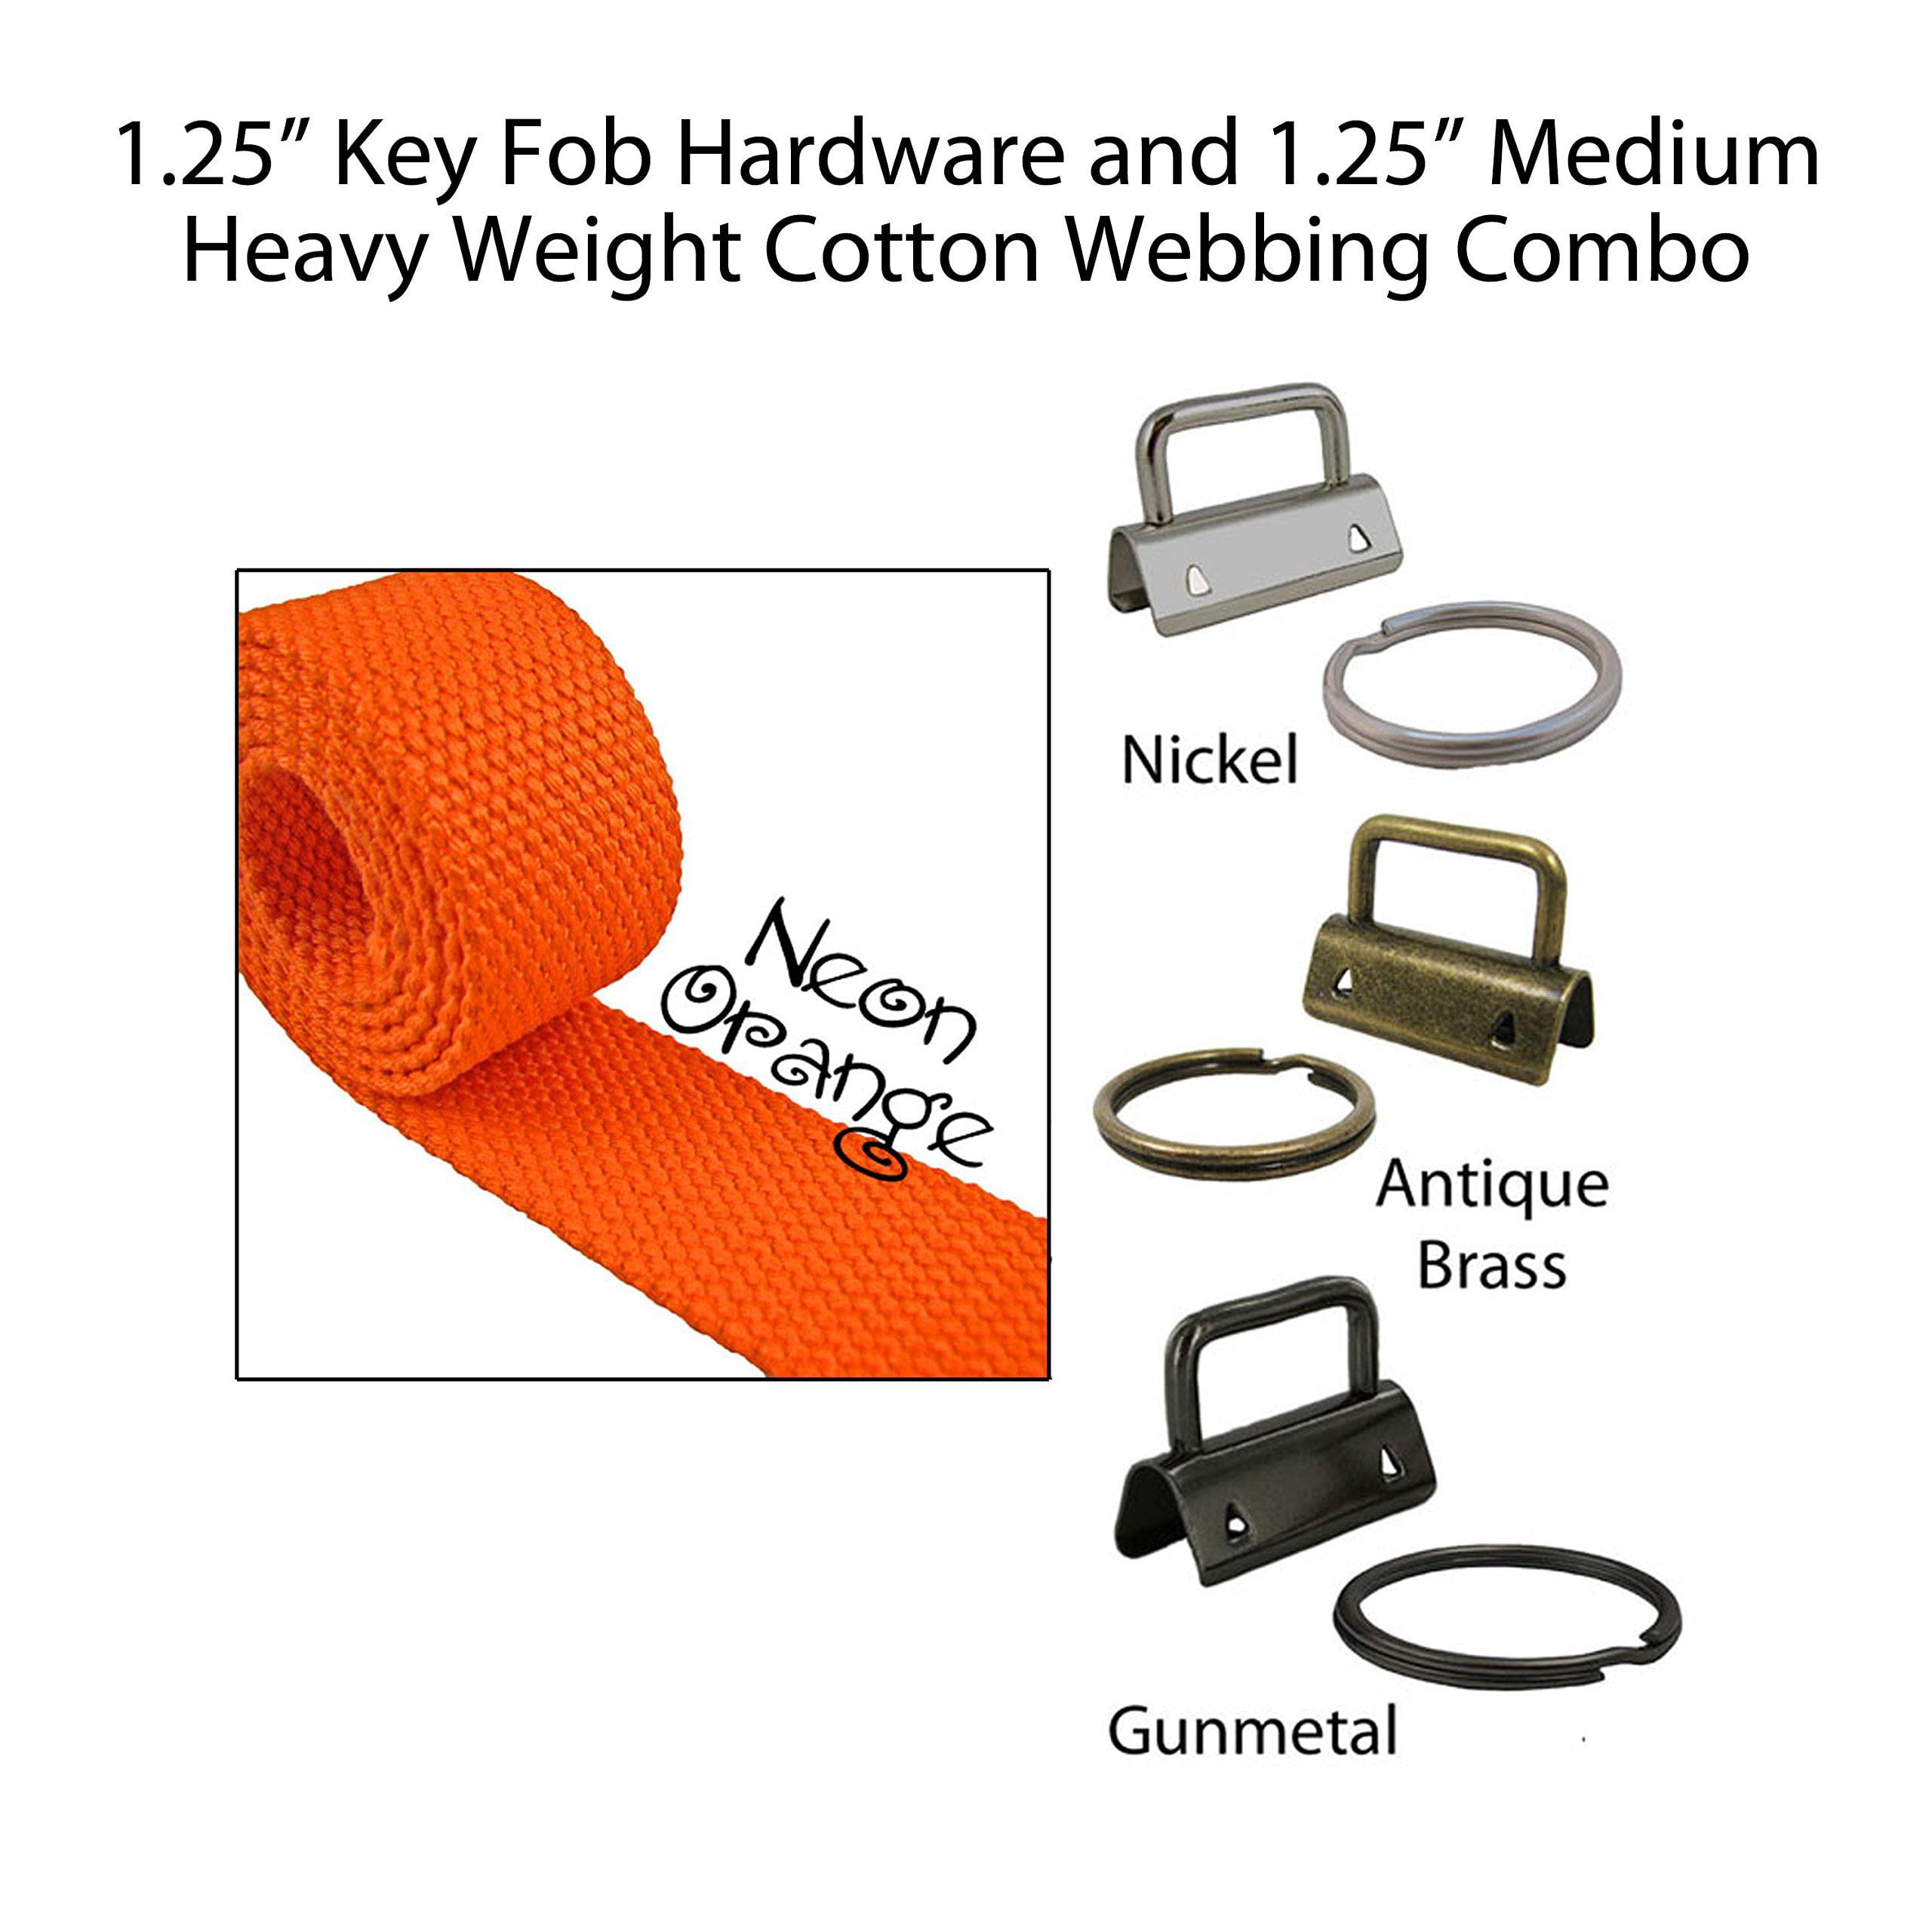 "1.25"" Key Fob Hardware and 1.25"" Cotton Webbing Combo - Neon Orange"